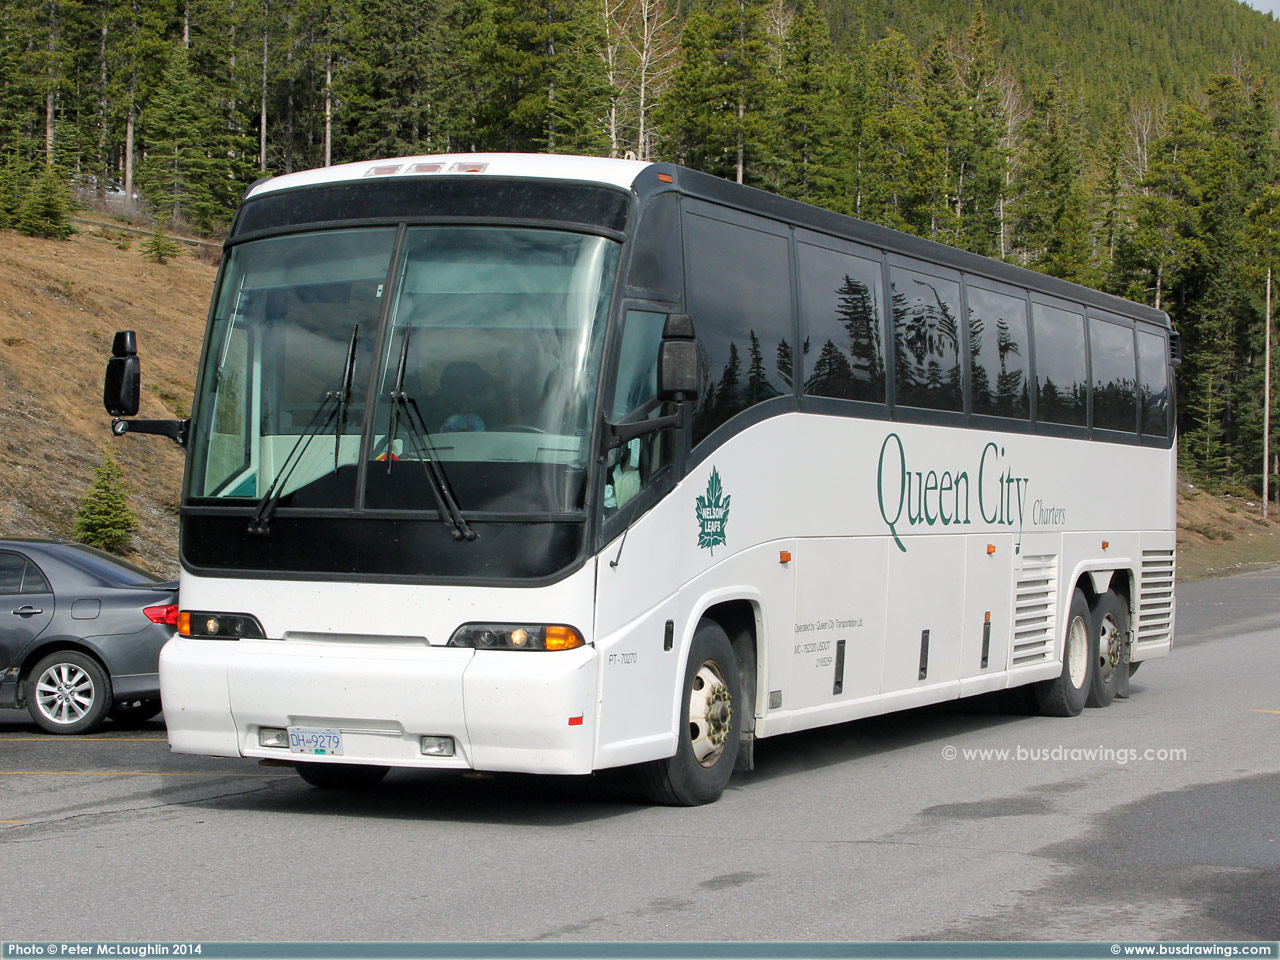 Filequeen City Transportation 54 A Jpg